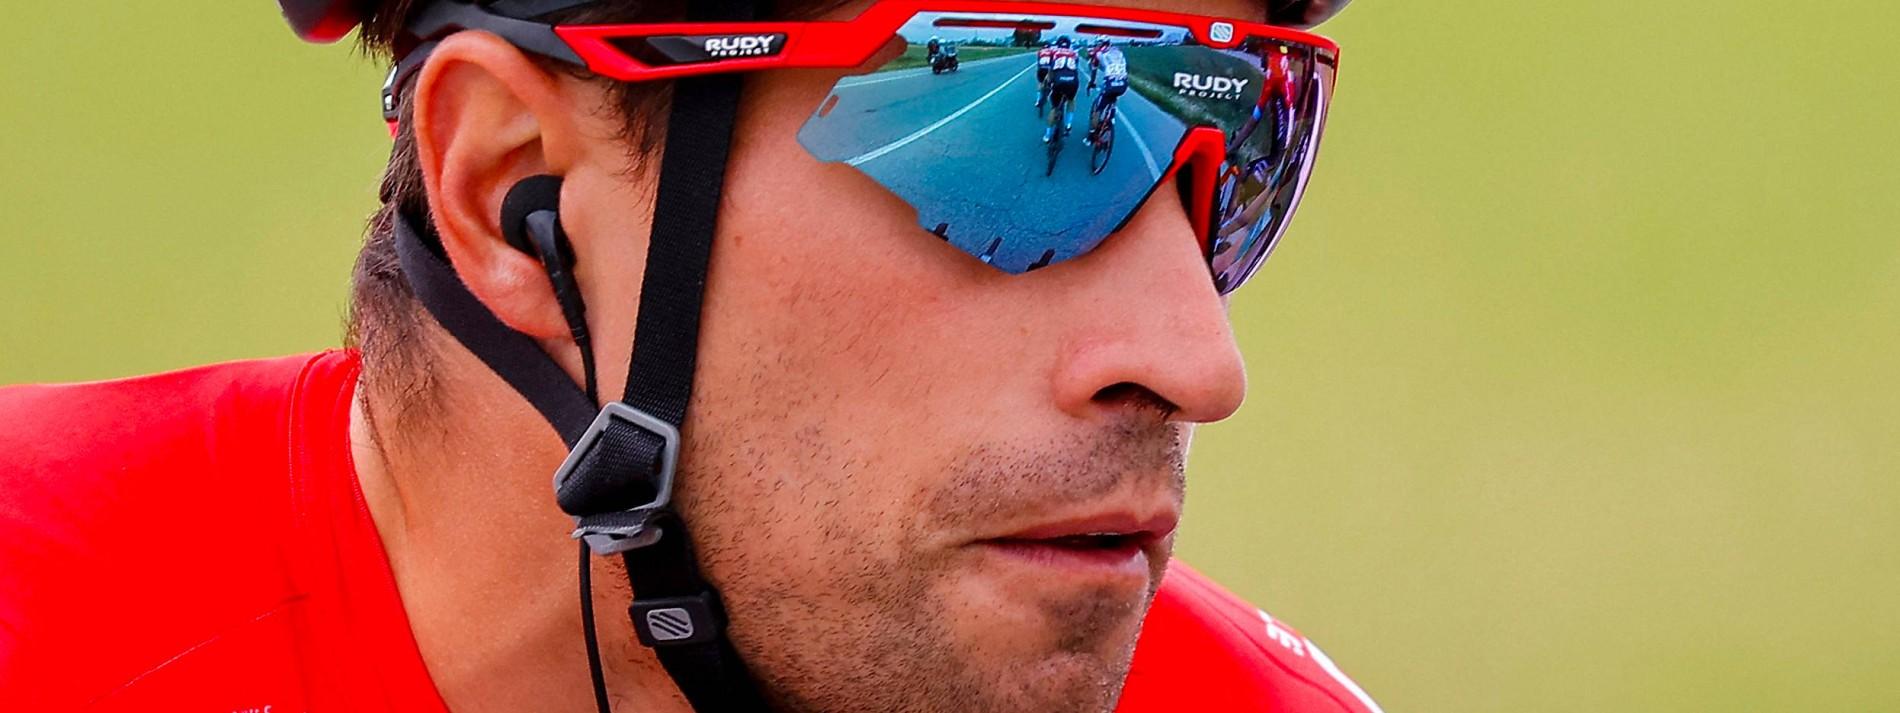 Ewan gewinnt Giro-Etappe – Landa schwer gestürzt